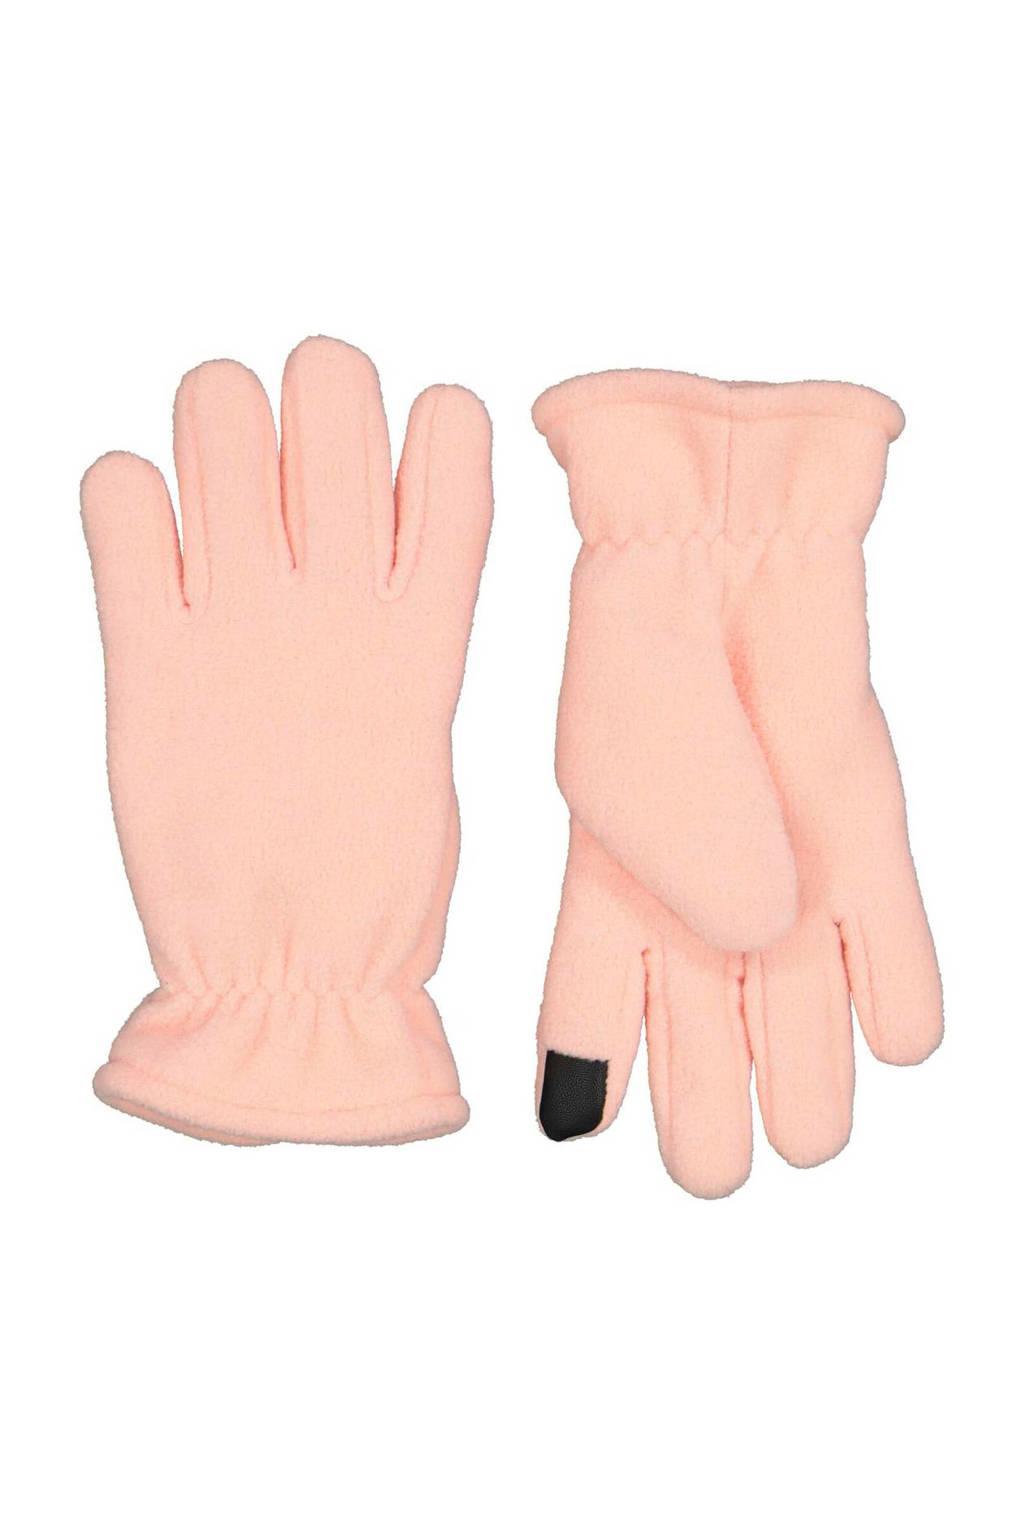 HEMA kinderhandschoenen touchscreen roze, Roze